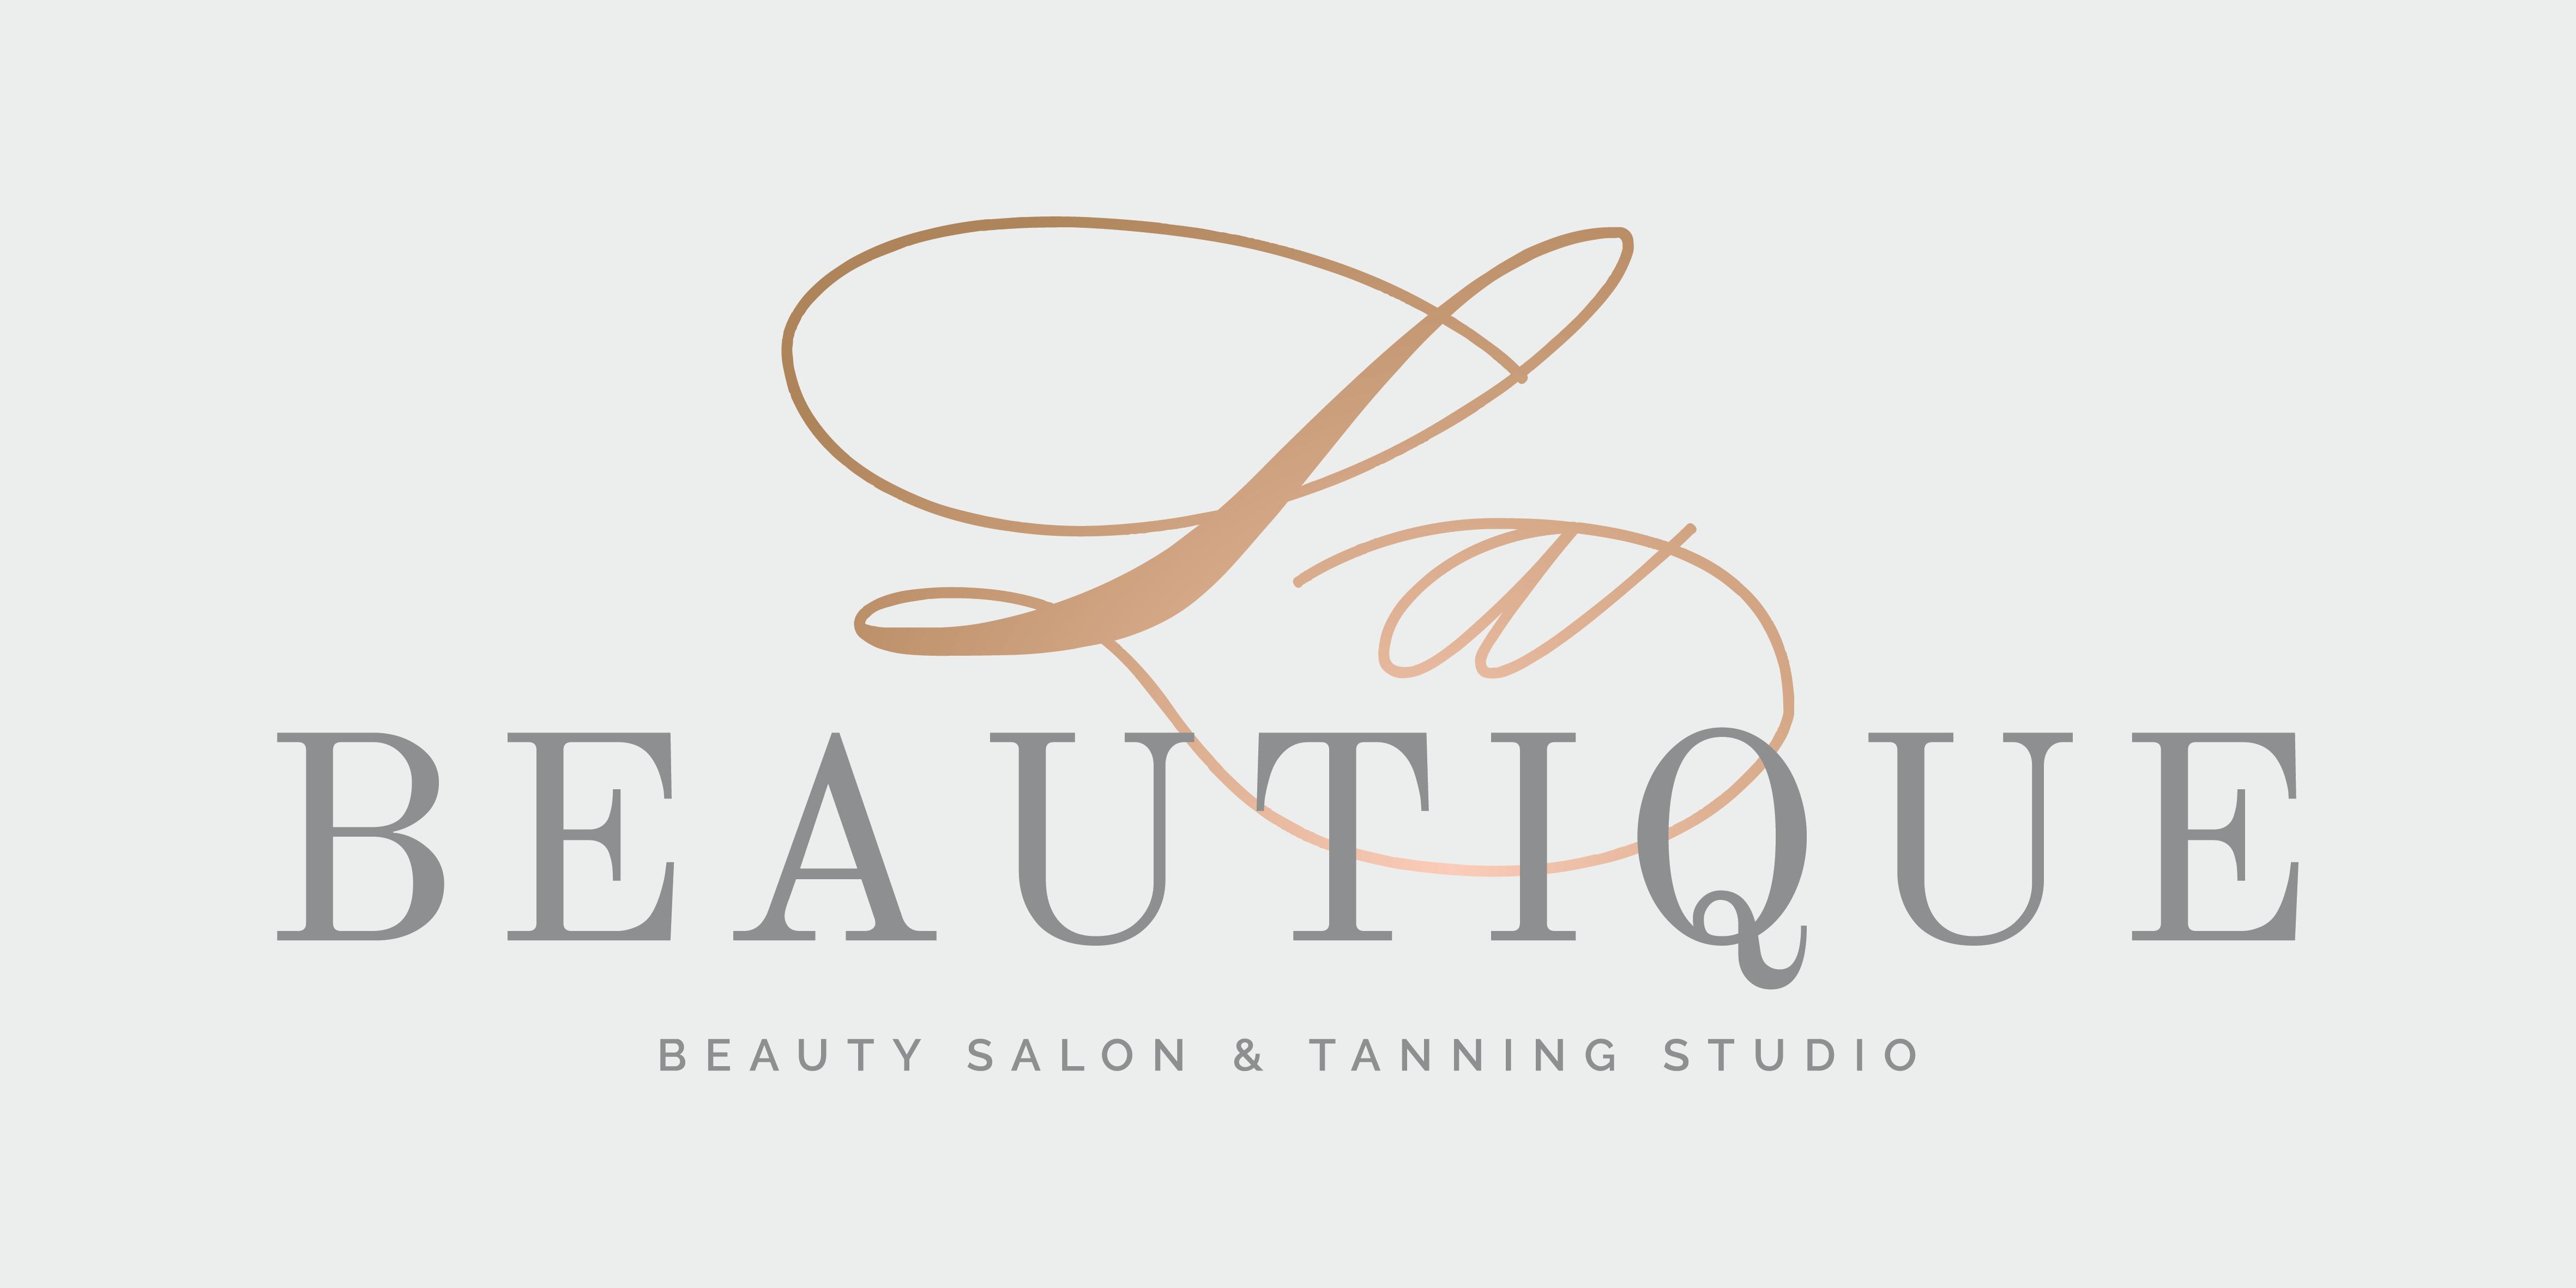 Brand new beauty salon, glamorous, feminine and eternal youth